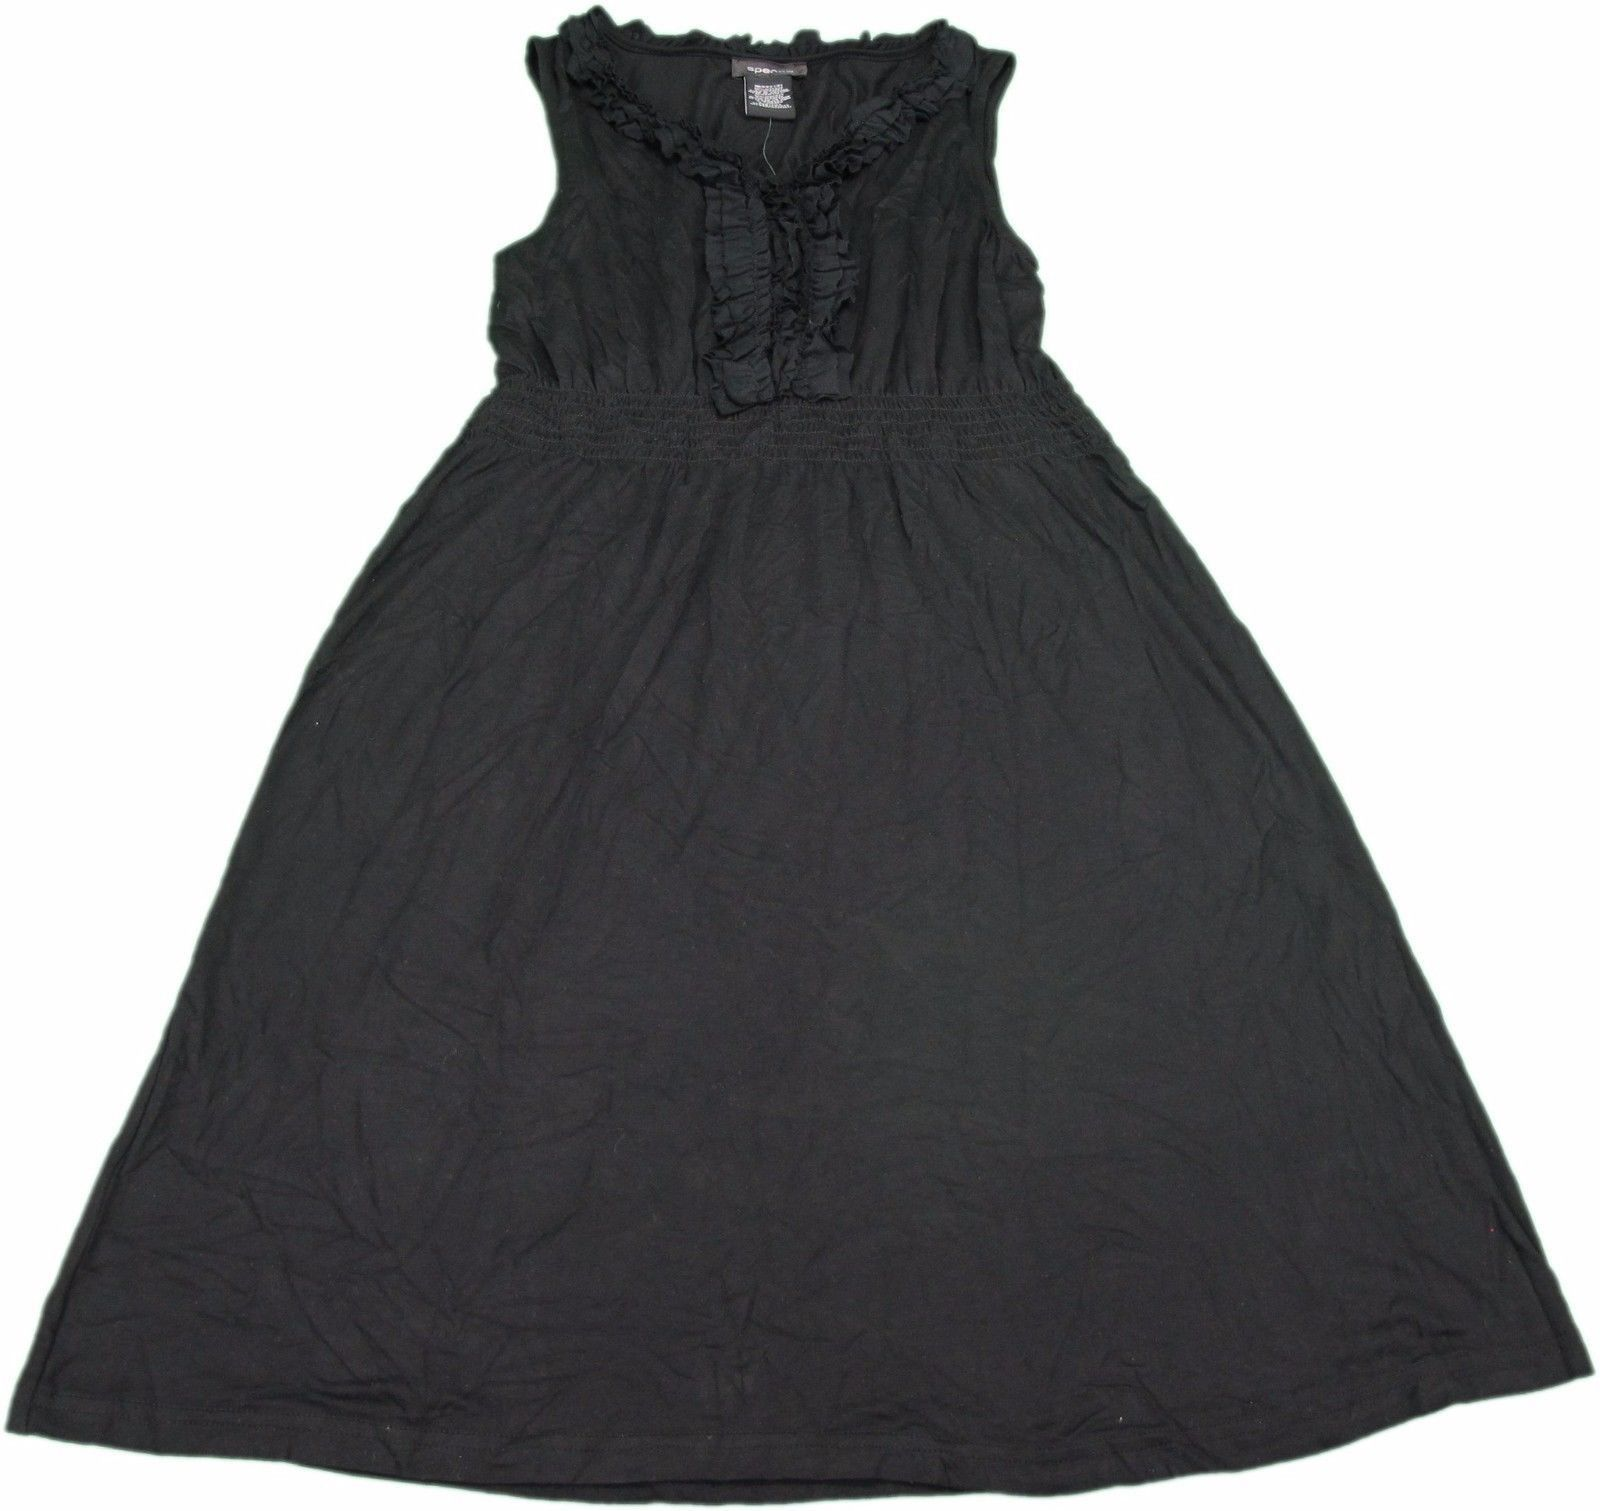 Spense Ladies Size Small Ruffle Collar Sundress, Black